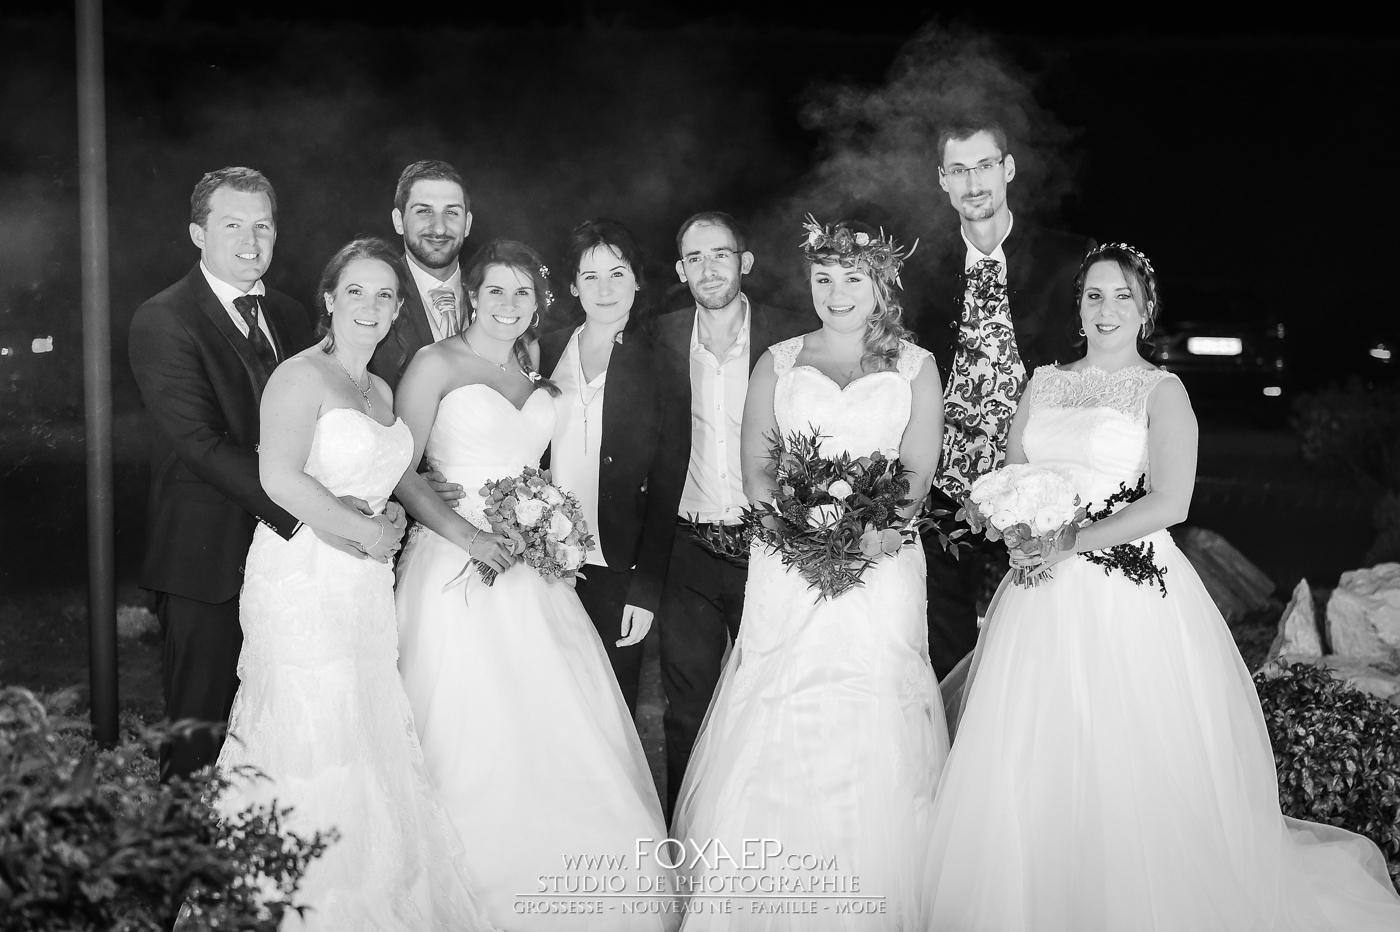 foxaep-photographe-mariage-dijon-annecy-lt-3581